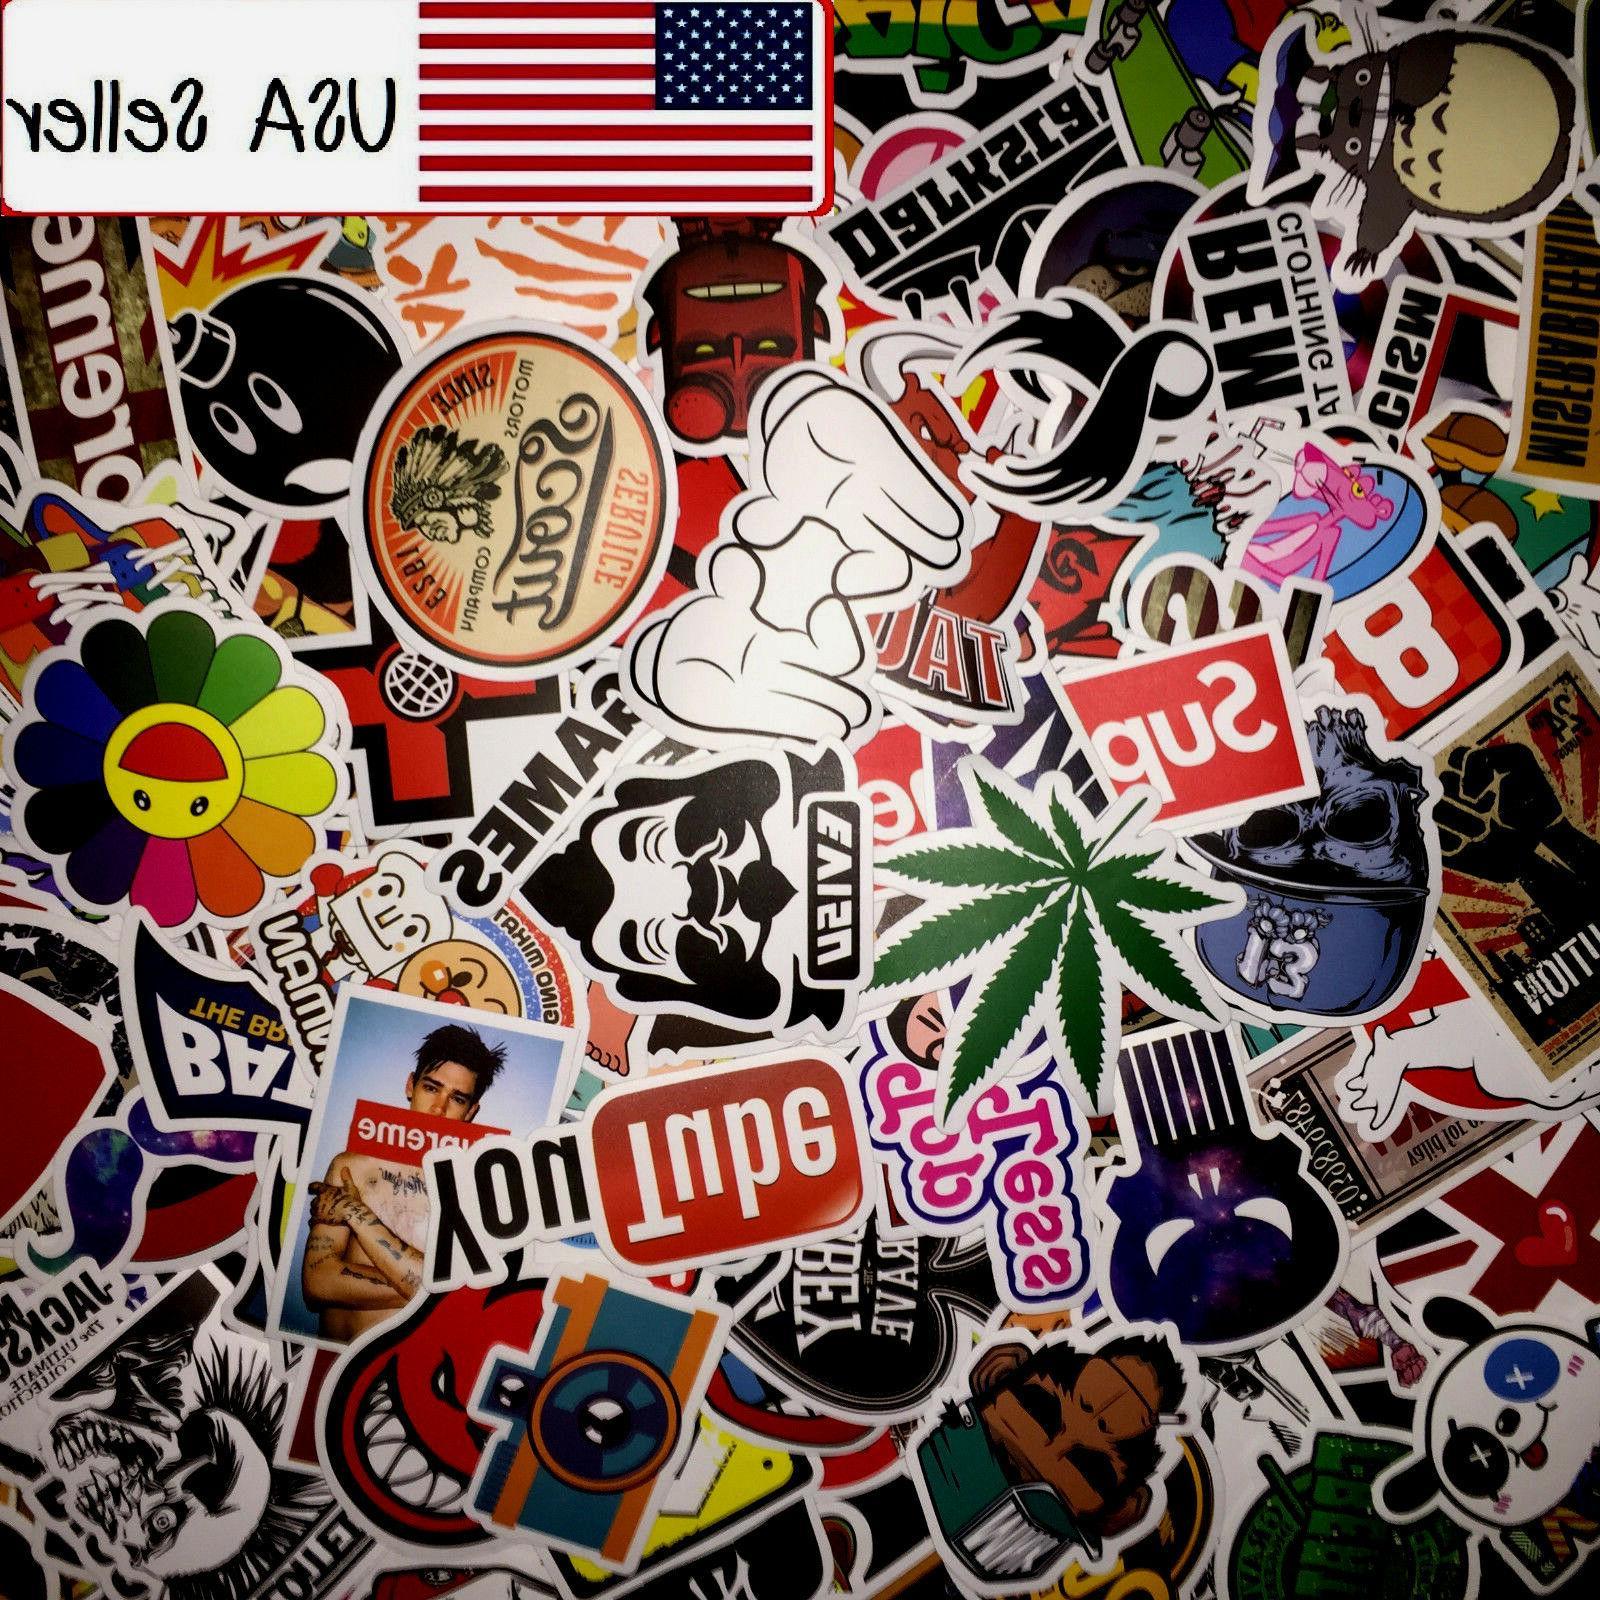 50 Random Skateboard Stickers Vinyl Laptop Luggage Decals Do